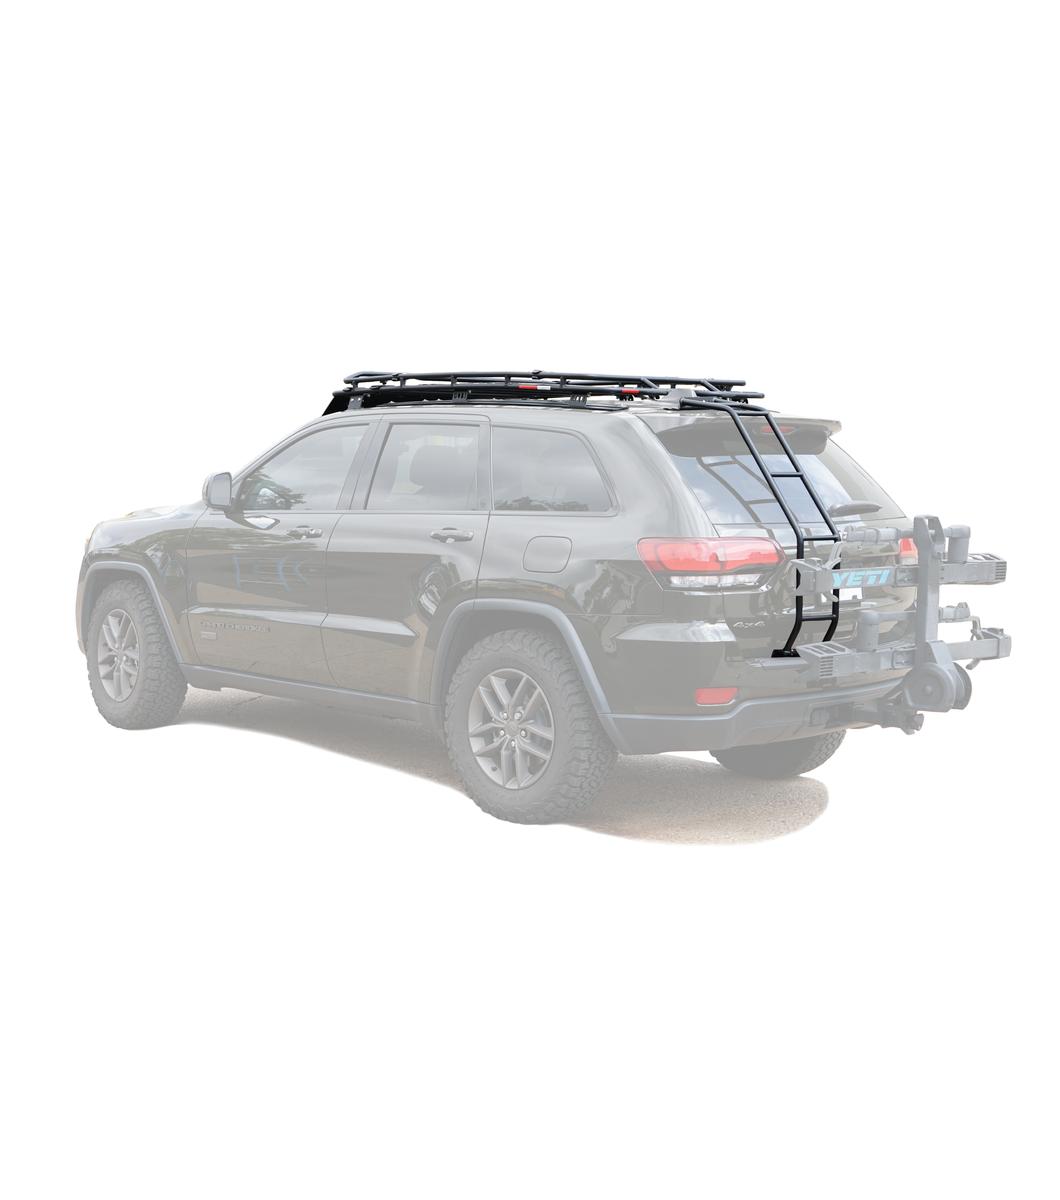 Gobi Jeep Grand Cherokee Wk2 Stealth Rack Lightbar Setup